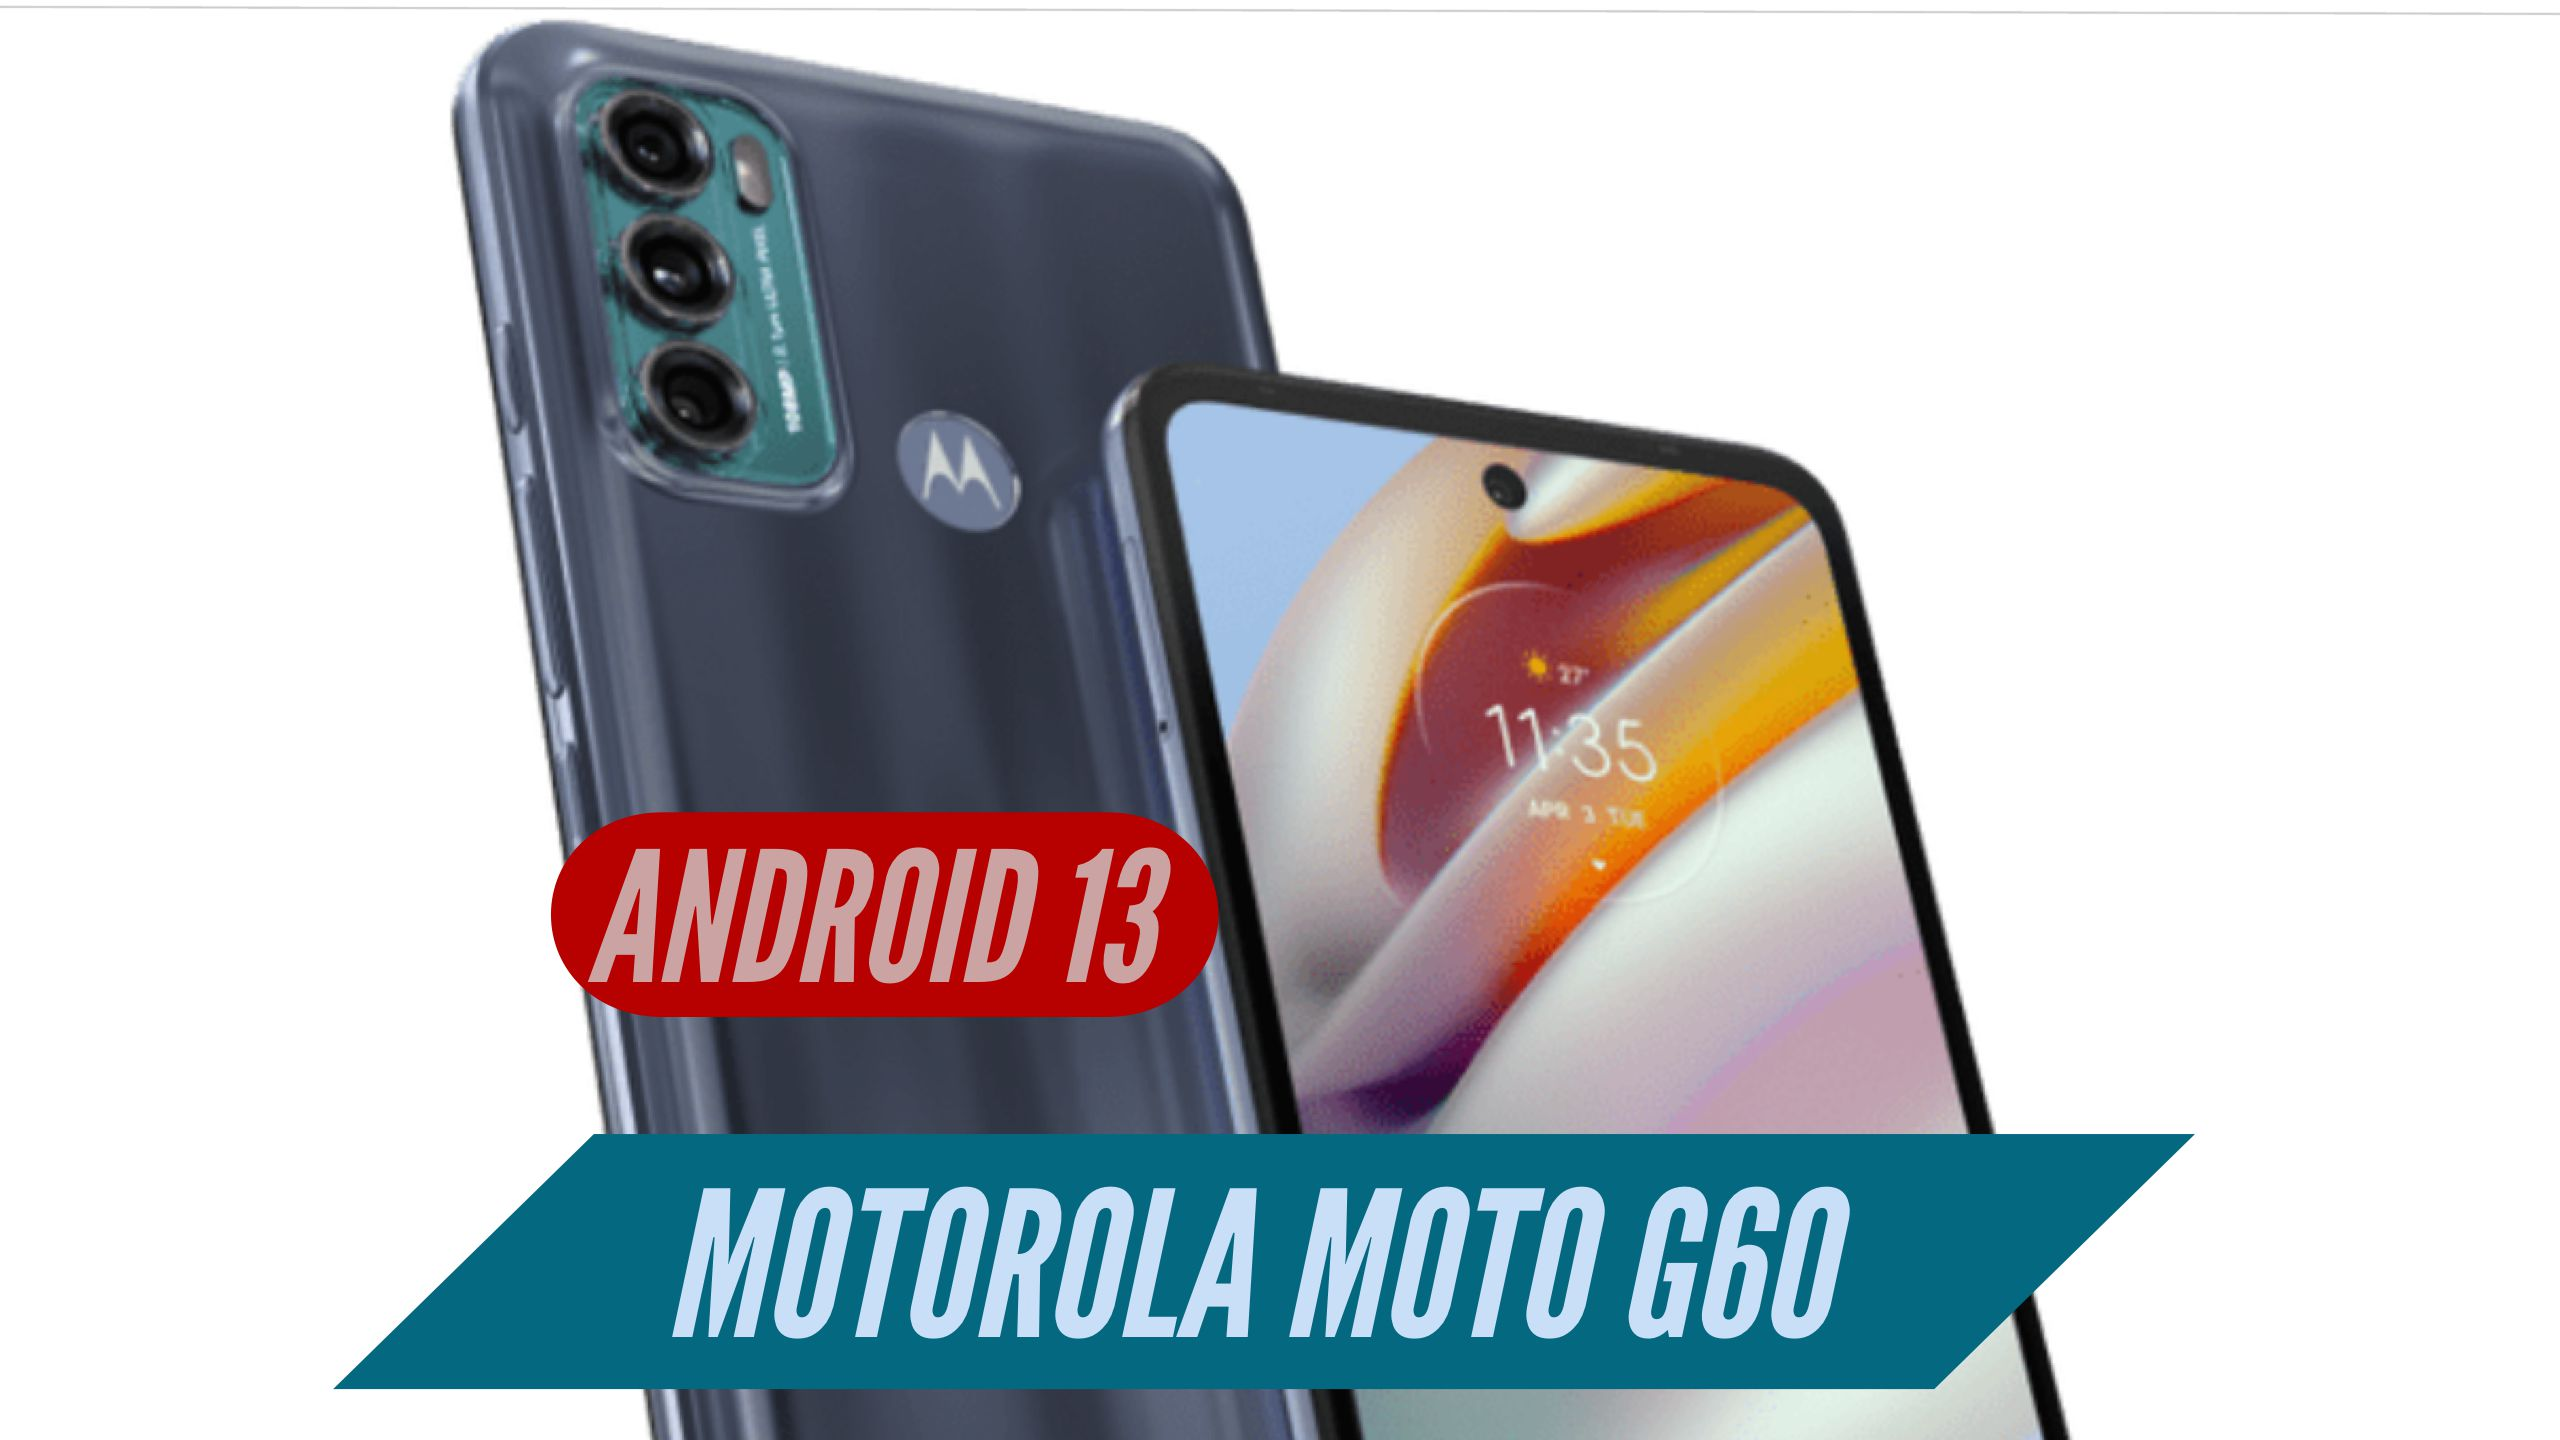 Motorola Moto G60 Android 13